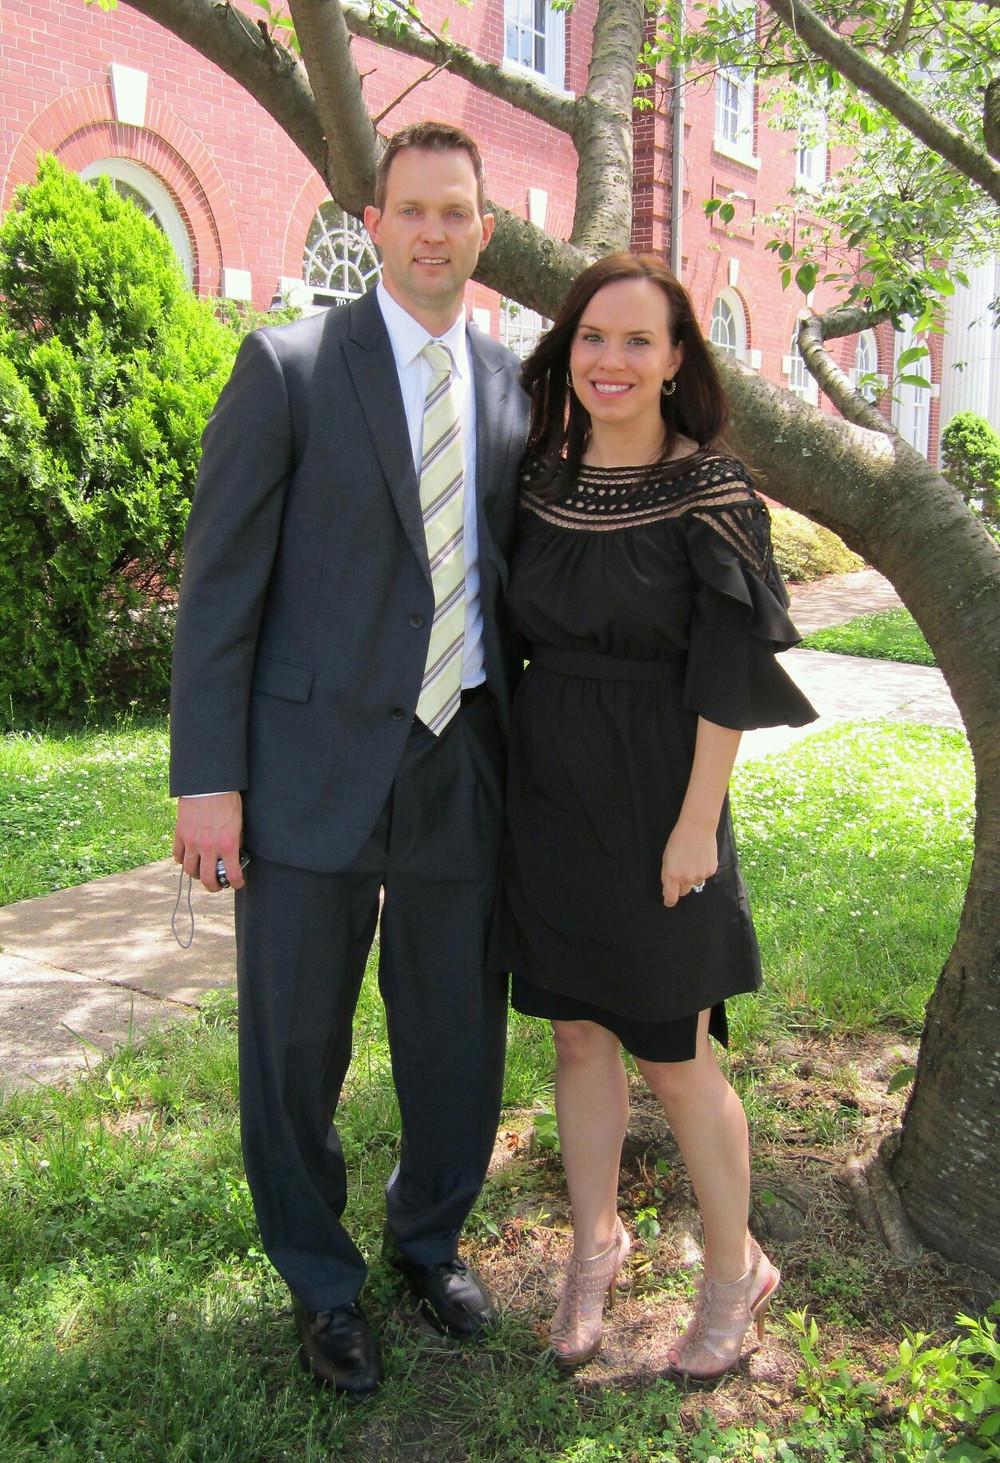 David and Paula Wideman, founder of paulaproduct, at University of North Carolina Greensboro, Department of Interior Architecture